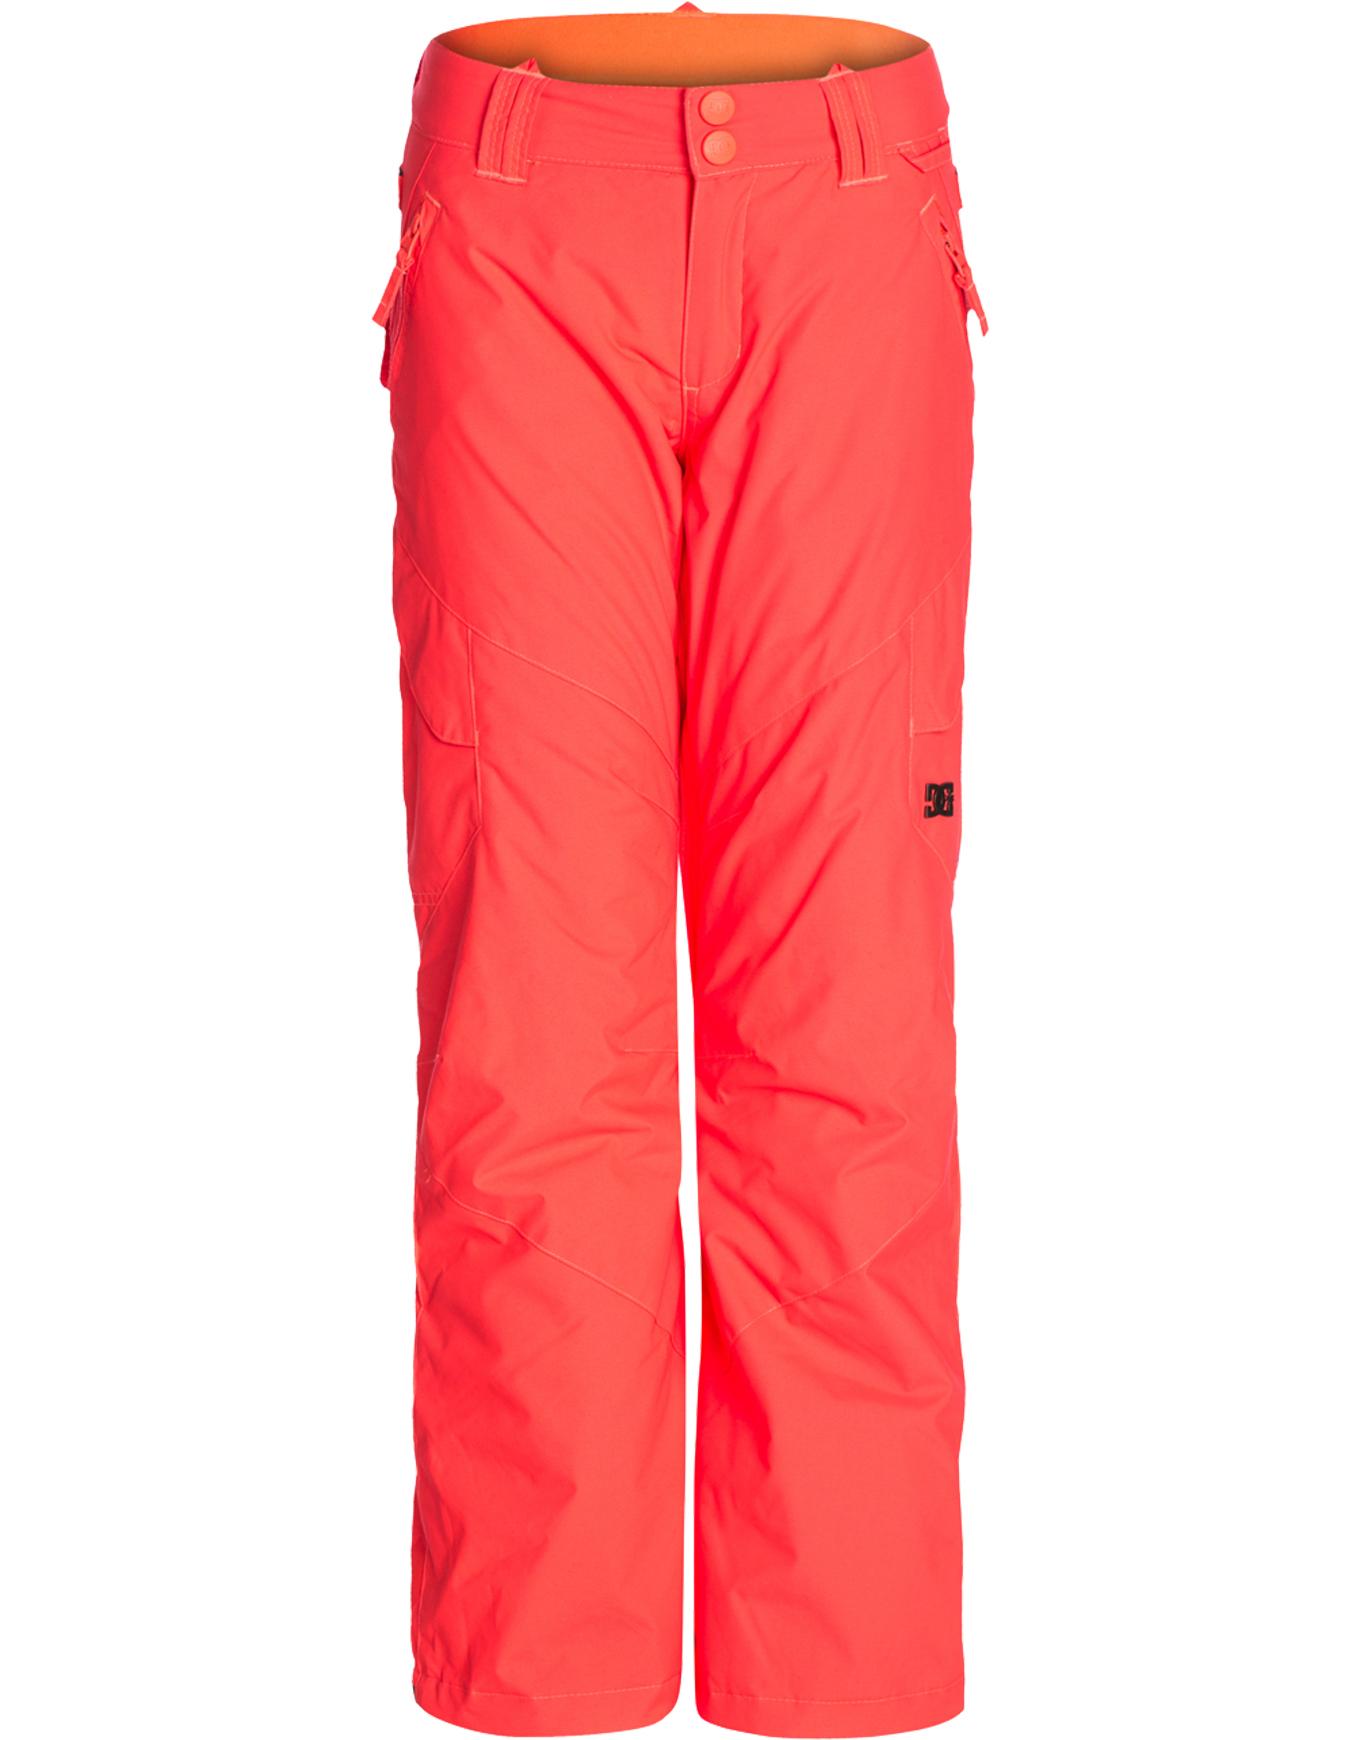 c0a38e66ae7d Pantalon ski enfant, pantalon snowboard enfant   Snowleader